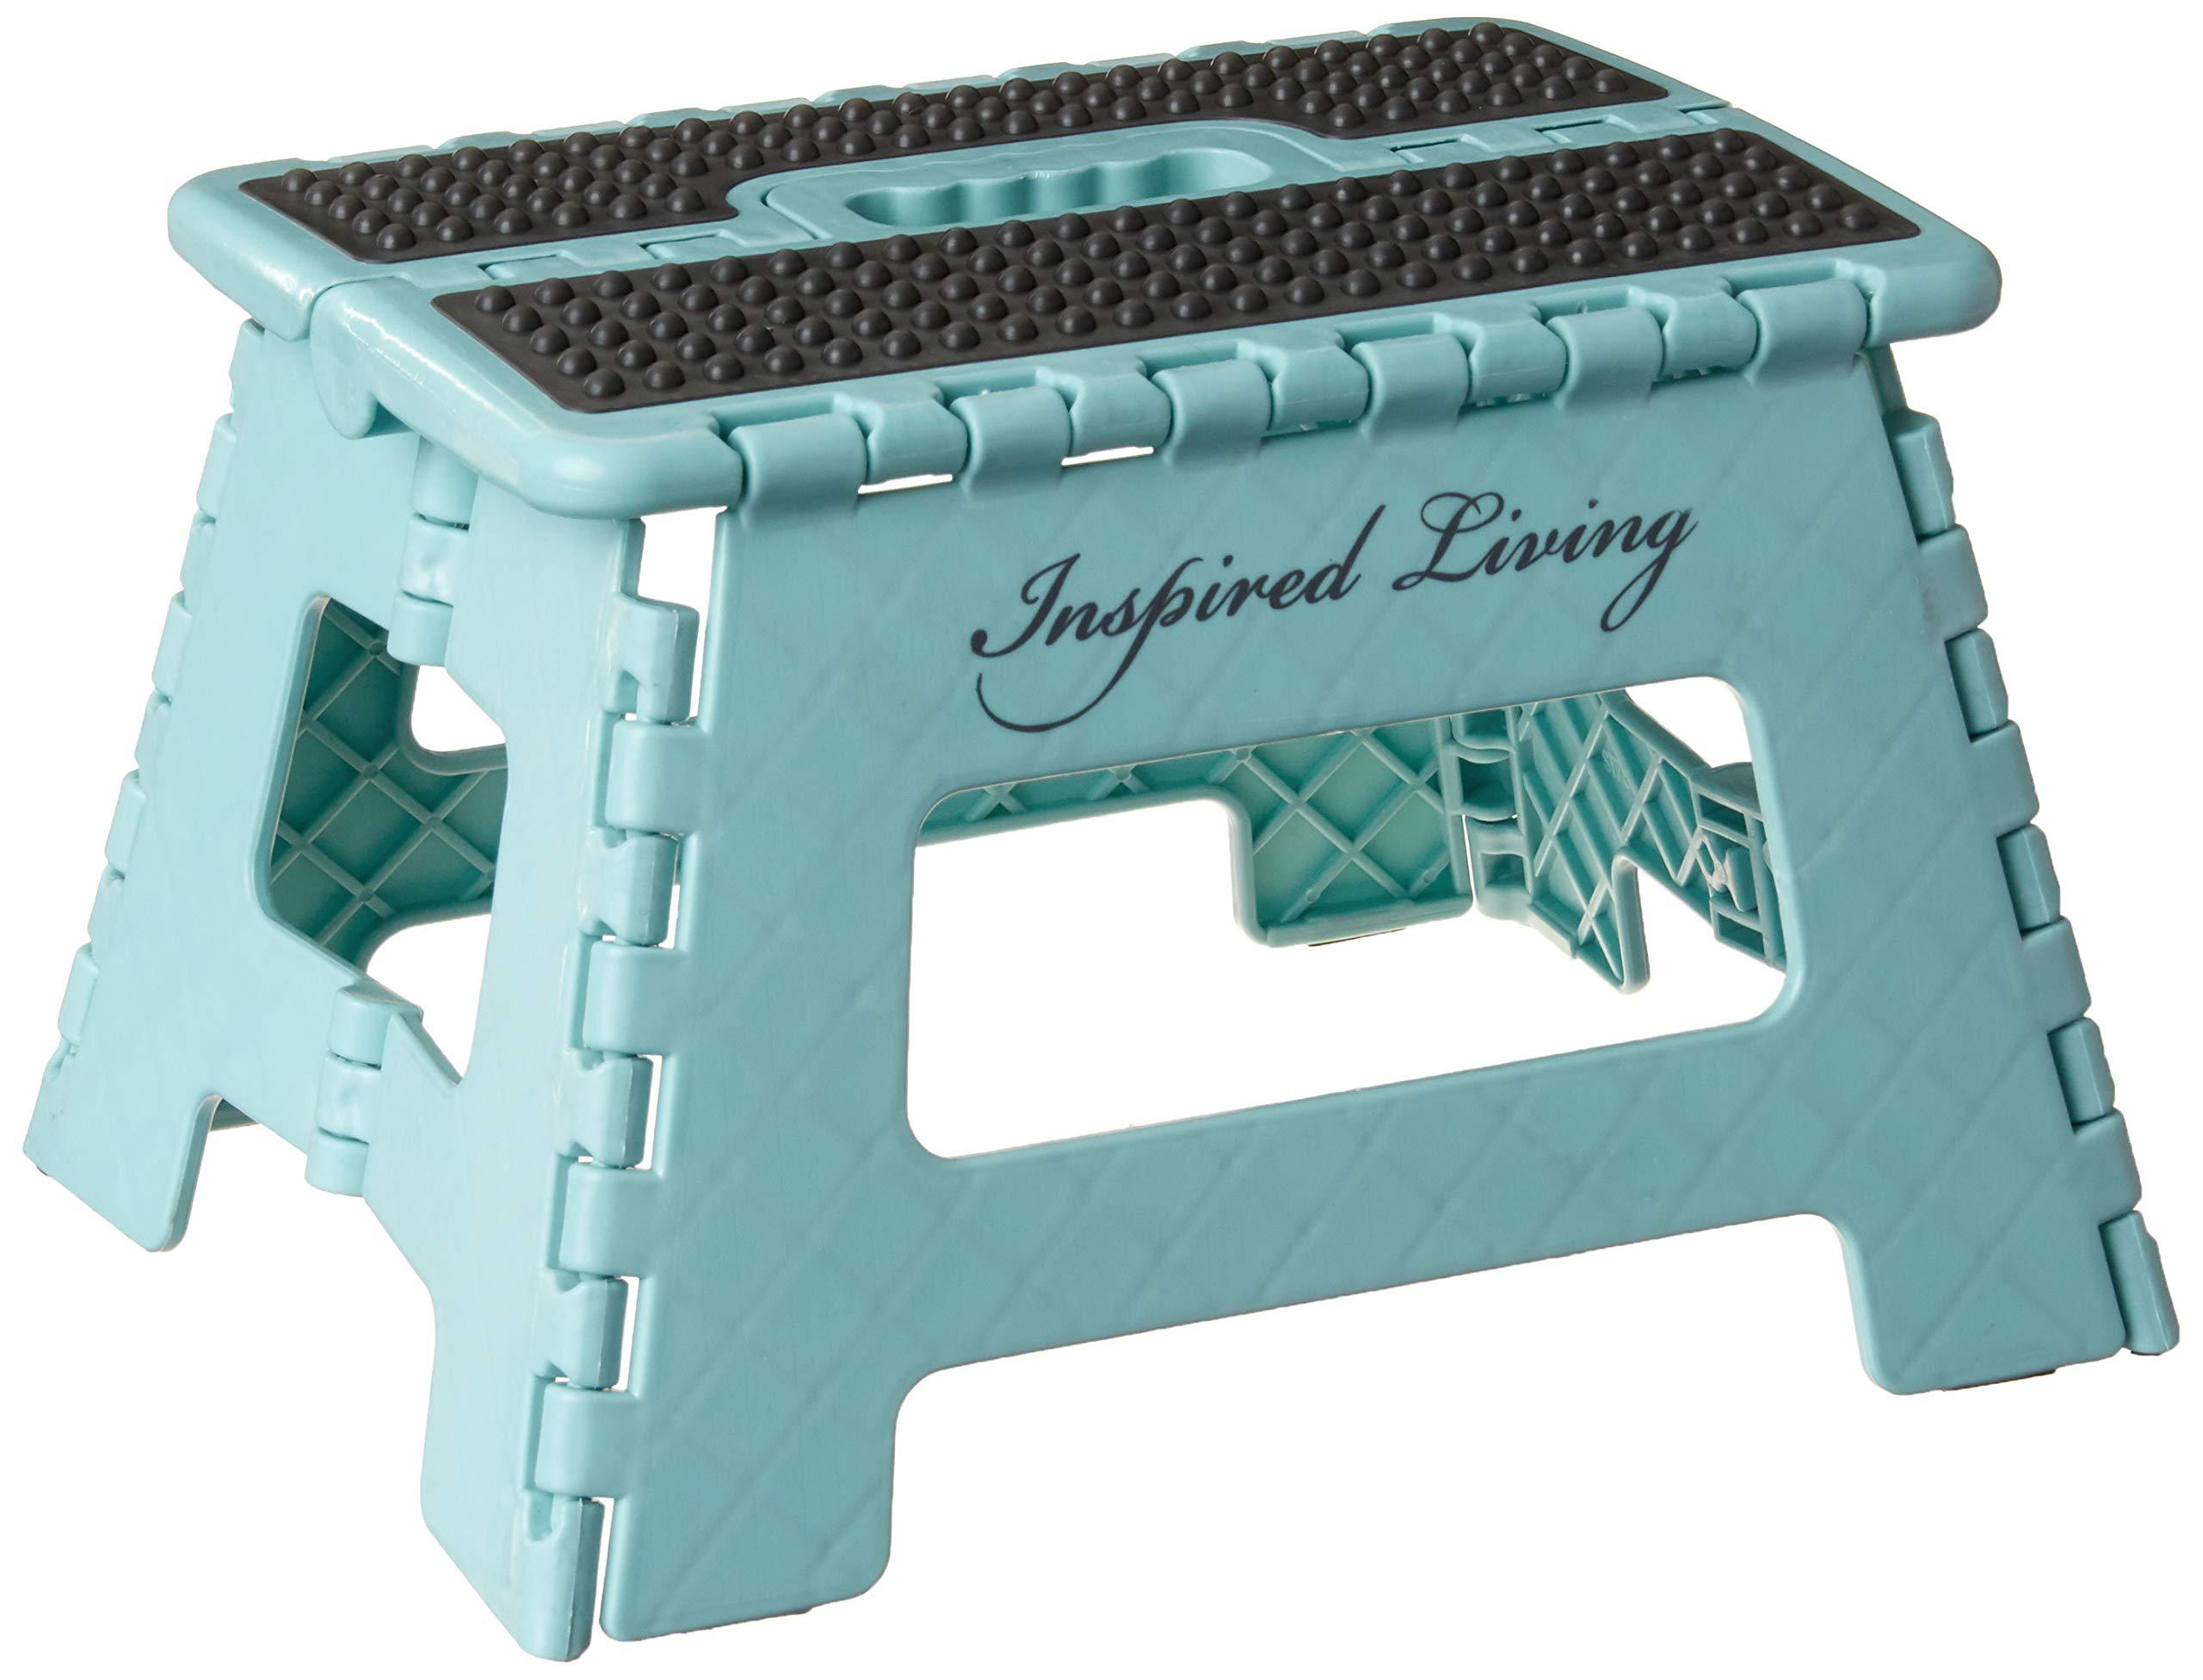 Inspired Living Folding Step Stool Heavy Duty, 9'' High, Blue Robins Egg by Inspired Living